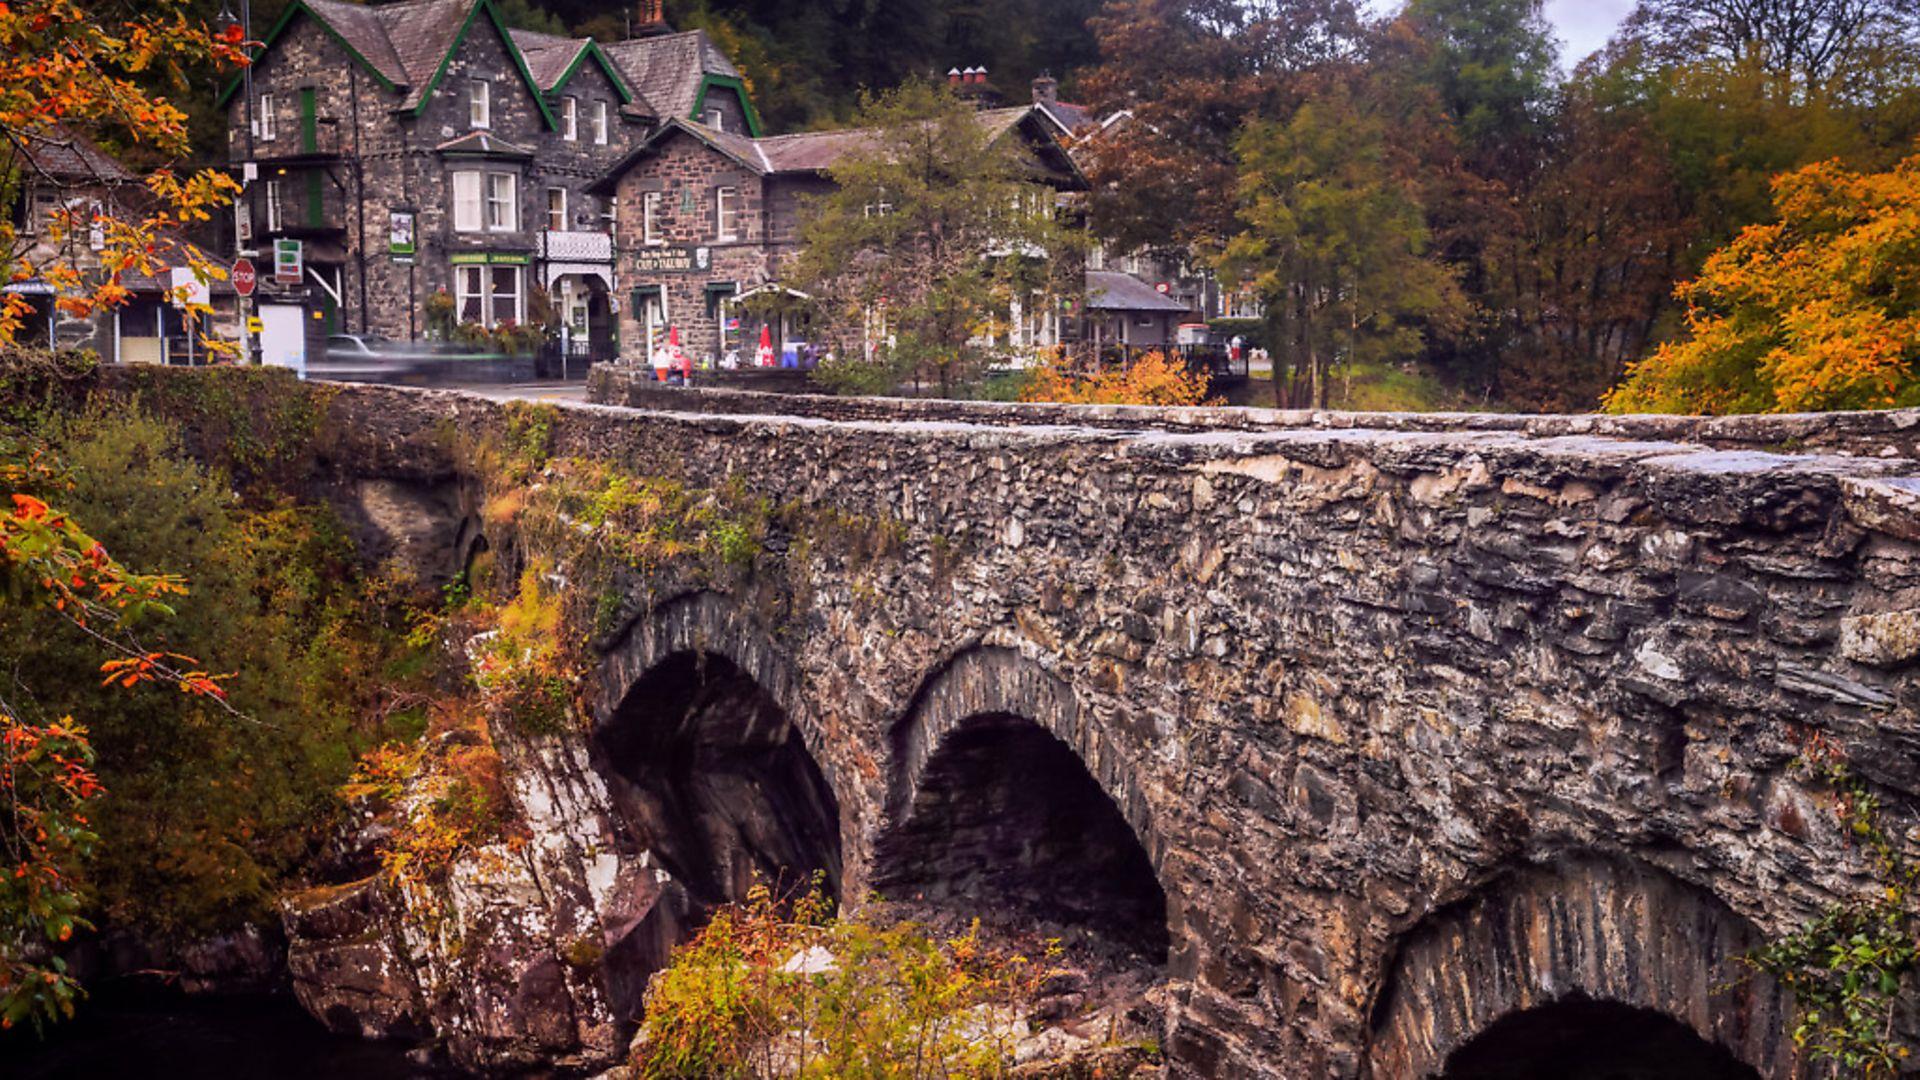 The Bridge at Betws-Y-Coed, Snowdonia, Wales - Credit: Getty Images